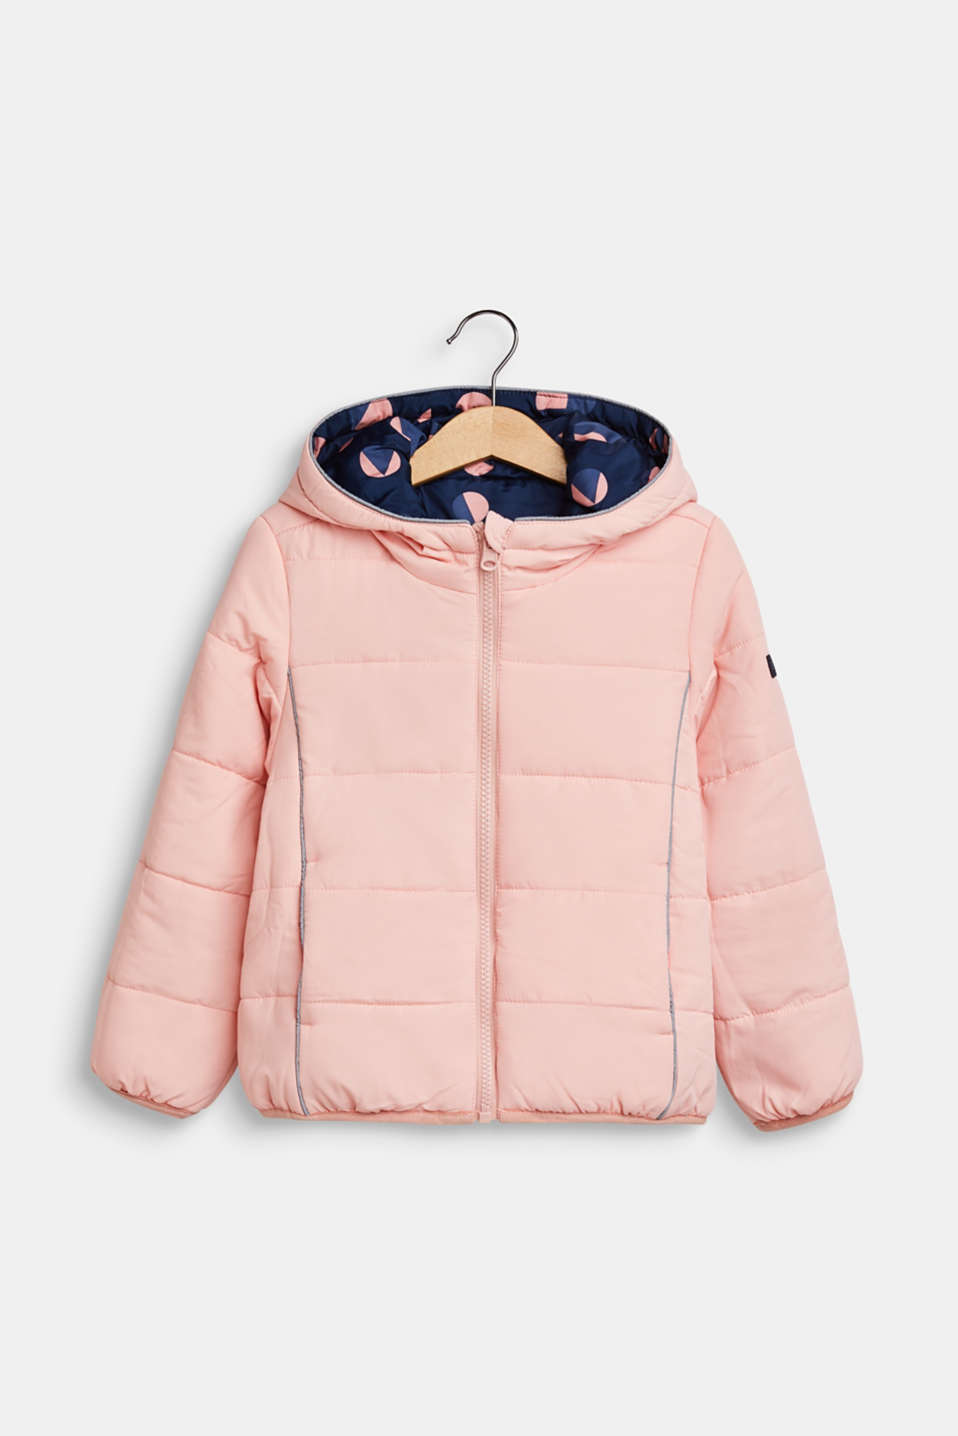 Padded reversible jacket, indigo, detail image number 3